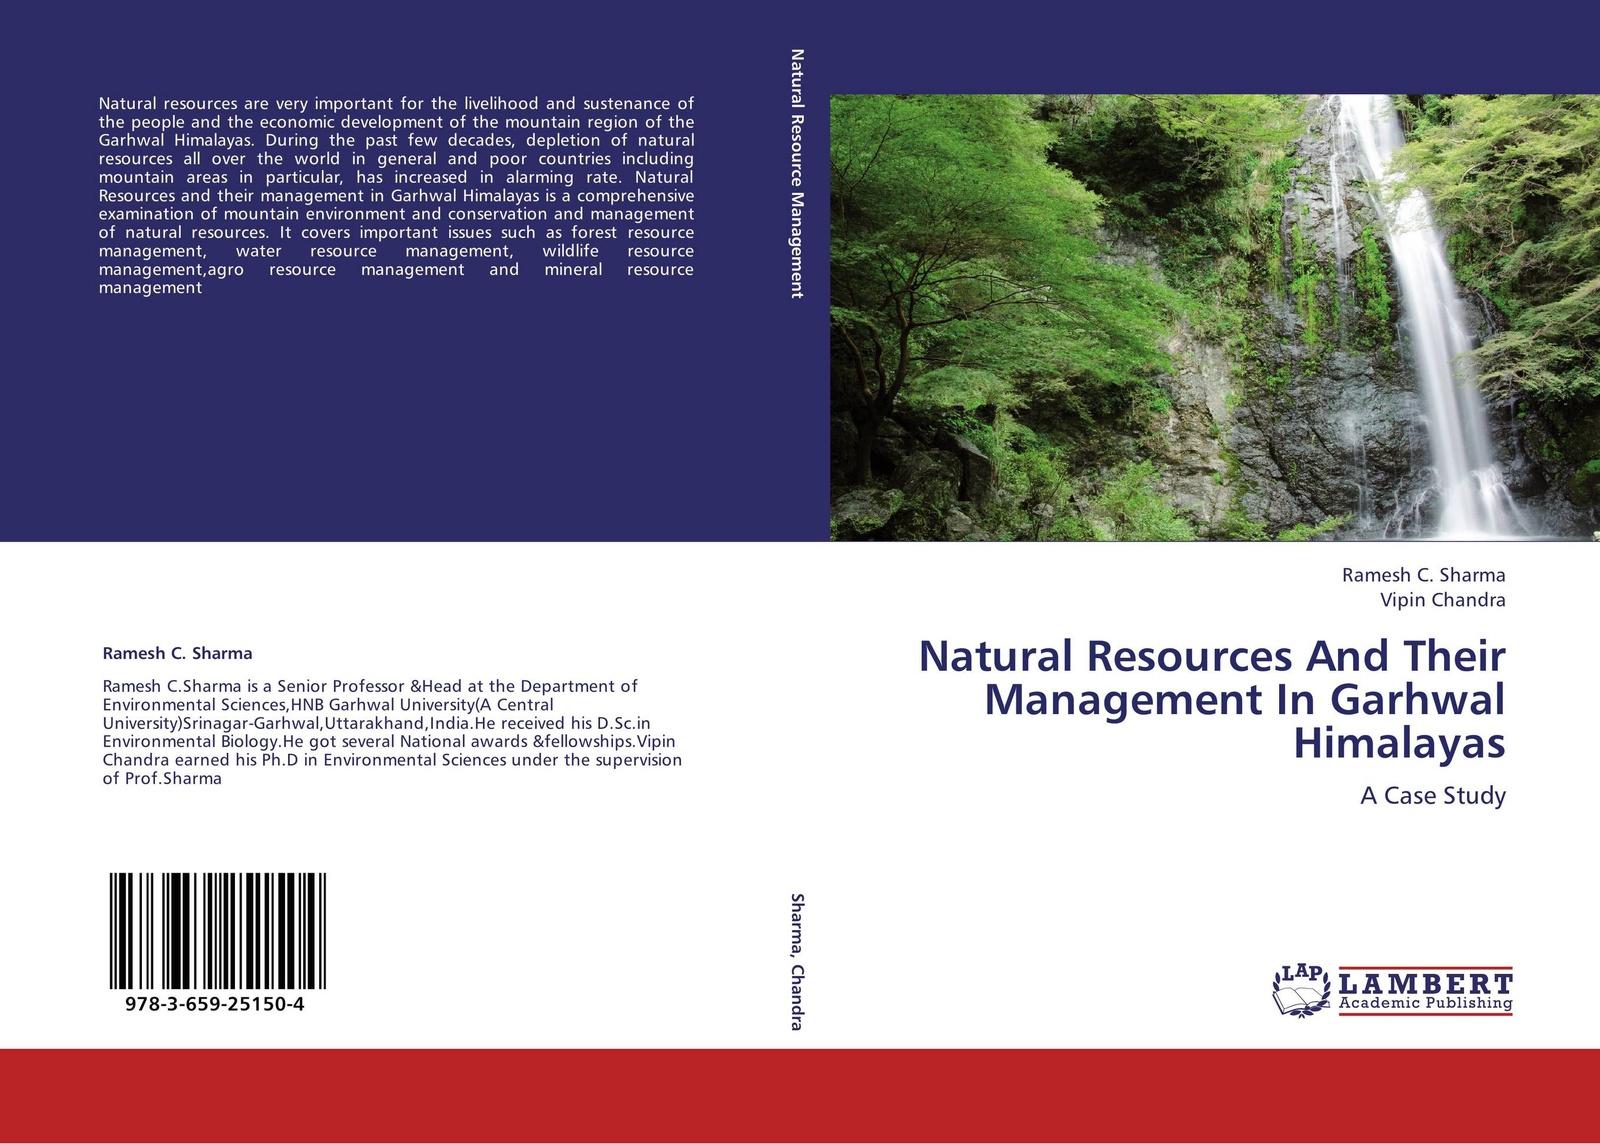 Ramesh C. Sharma and Vipin Chandra Natural Resources And Their Management In Garhwal Himalayas